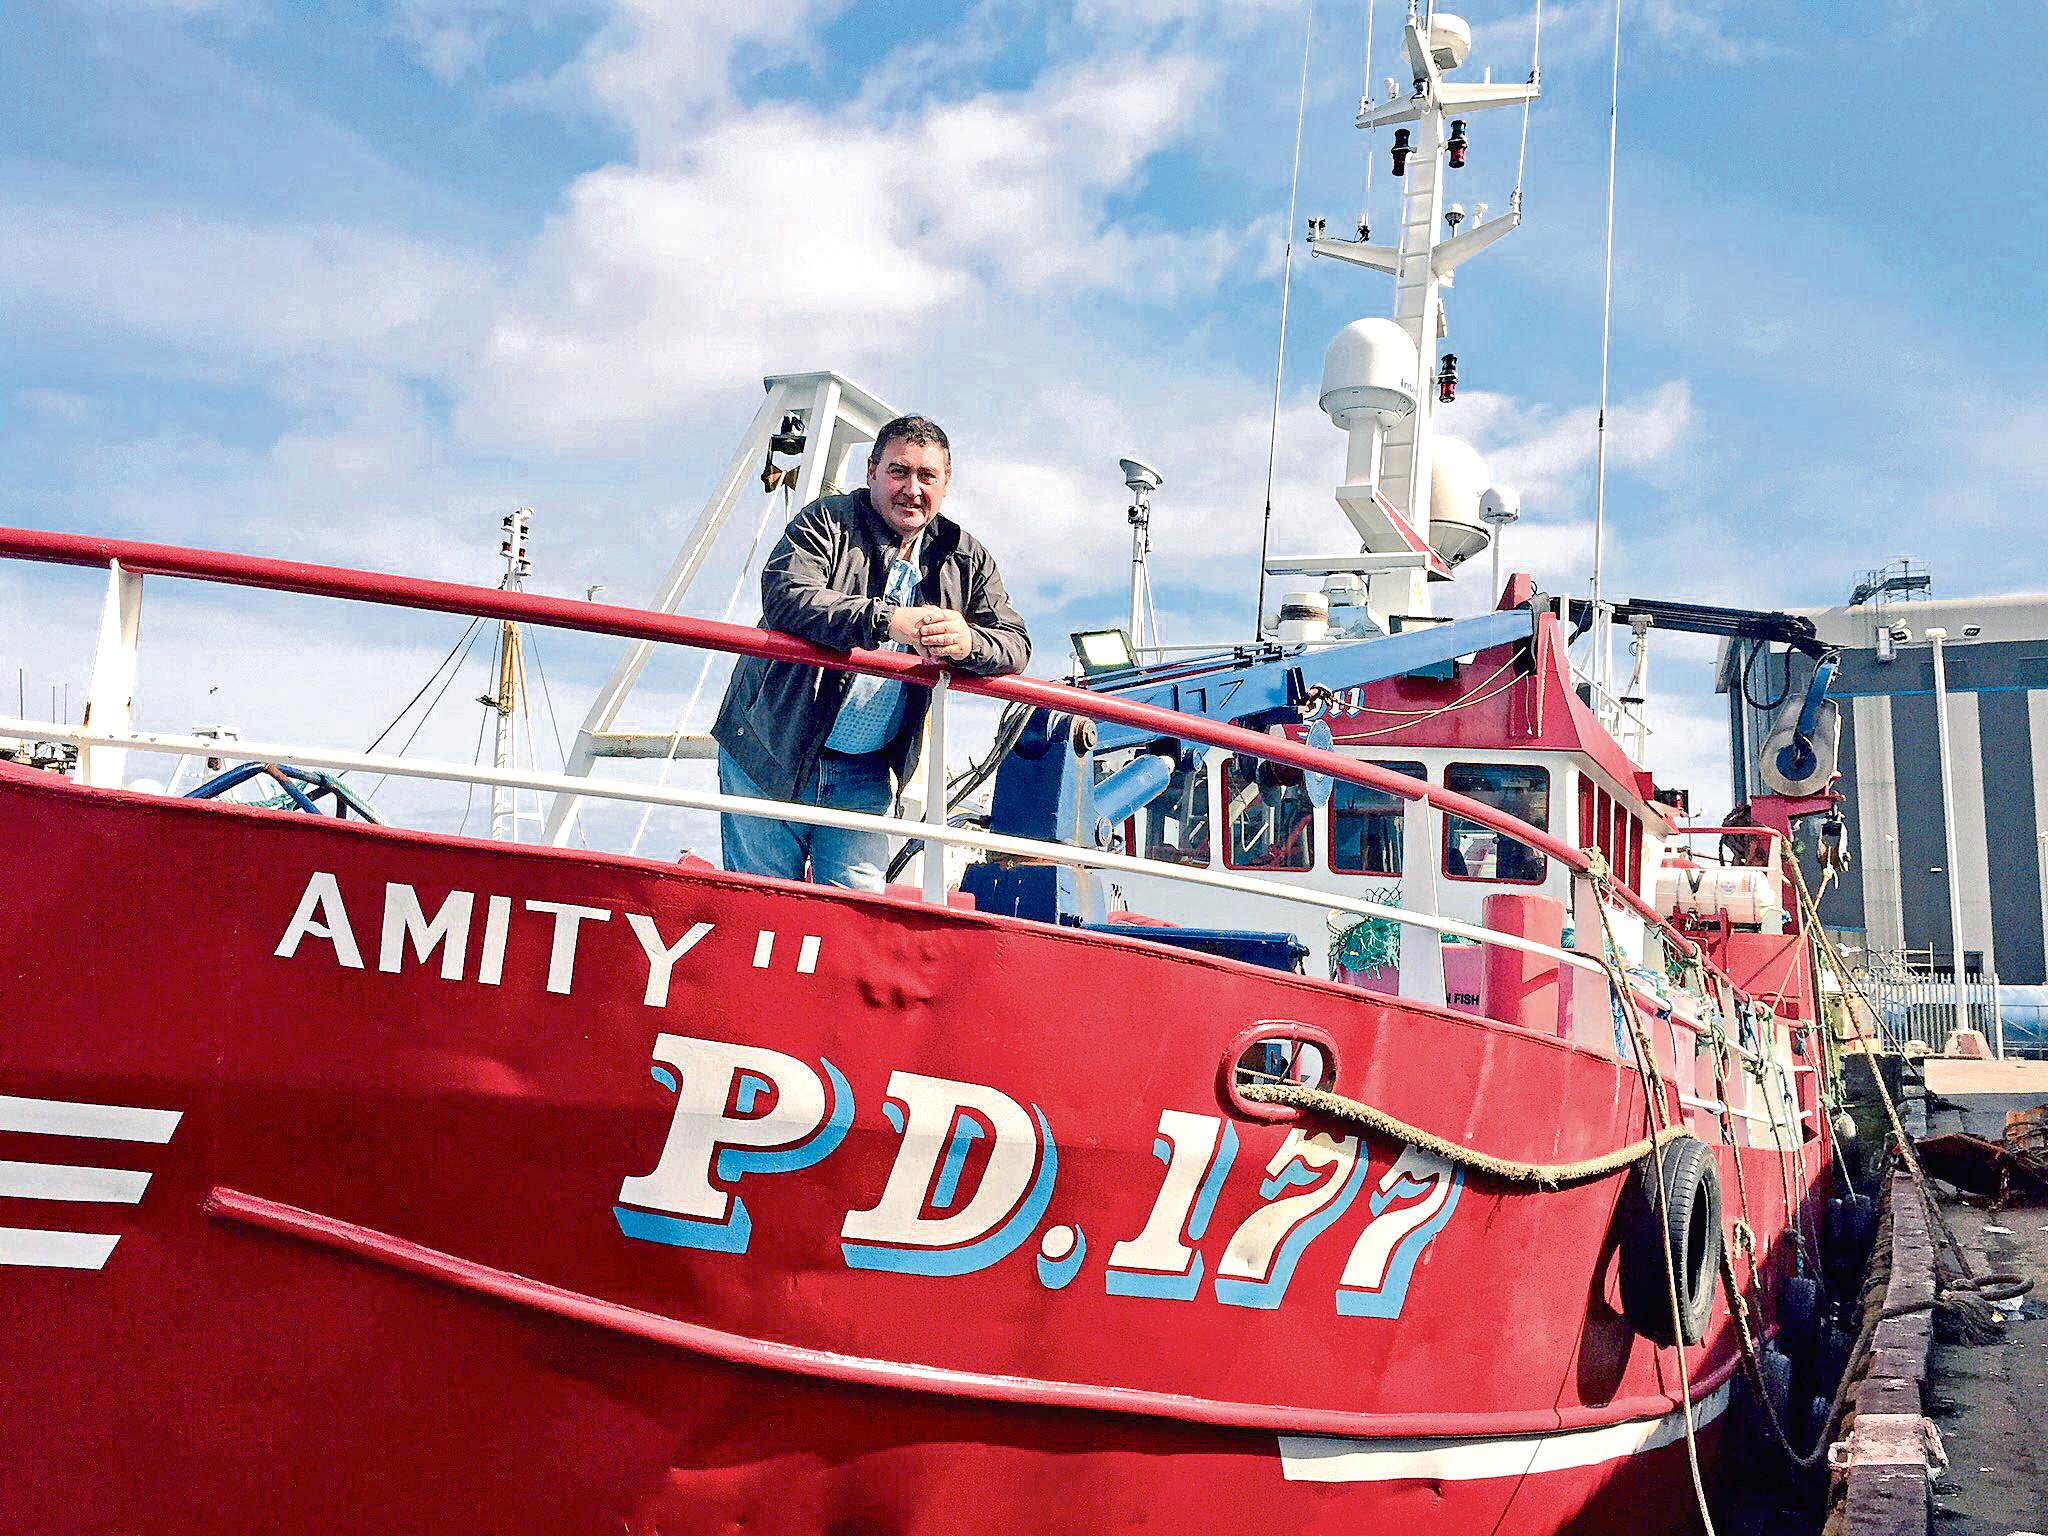 Jimmy Buchan on his boat, Amity II